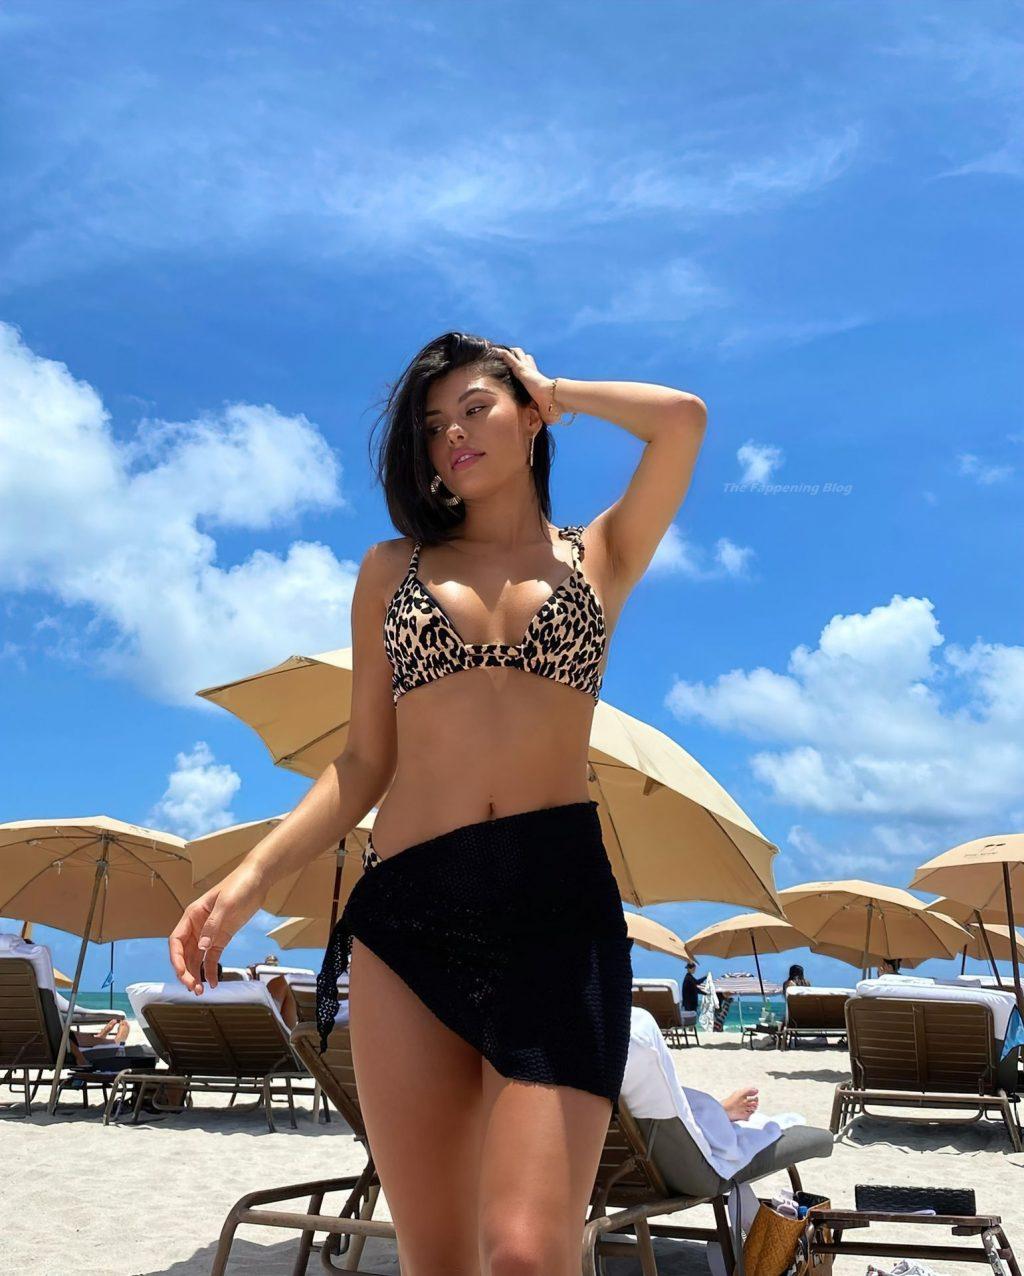 Sophia Gasca Looks Hot in an Animal Print Bikini at the Beach in Miami (24 Photos)